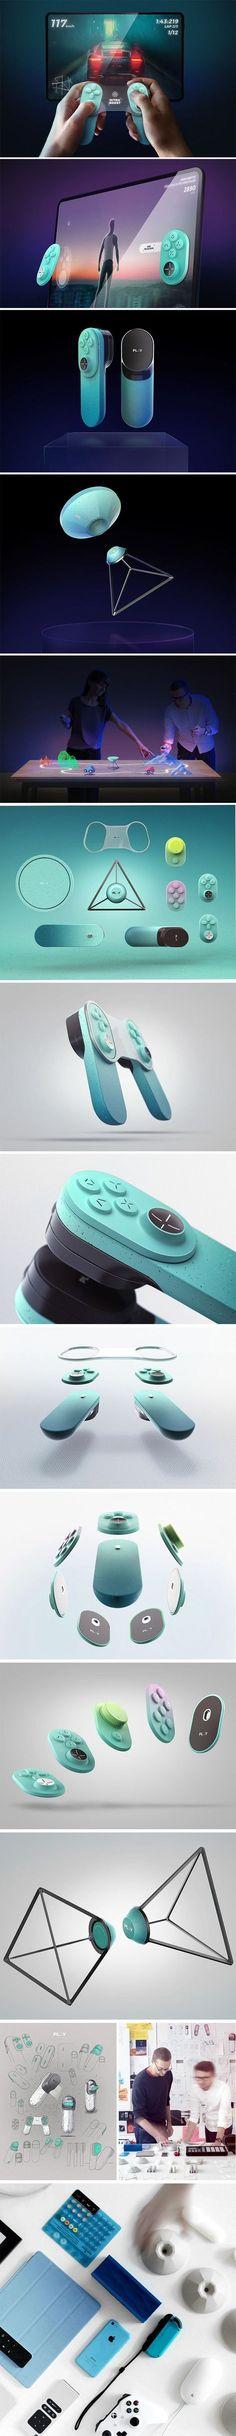 New Technology Gadgets, Futuristic Technology, Futuristic Design, Clever Gadgets, Cool Gadgets To Buy, Tech Gadgets, Web Design, Game Design, Future Gadgets